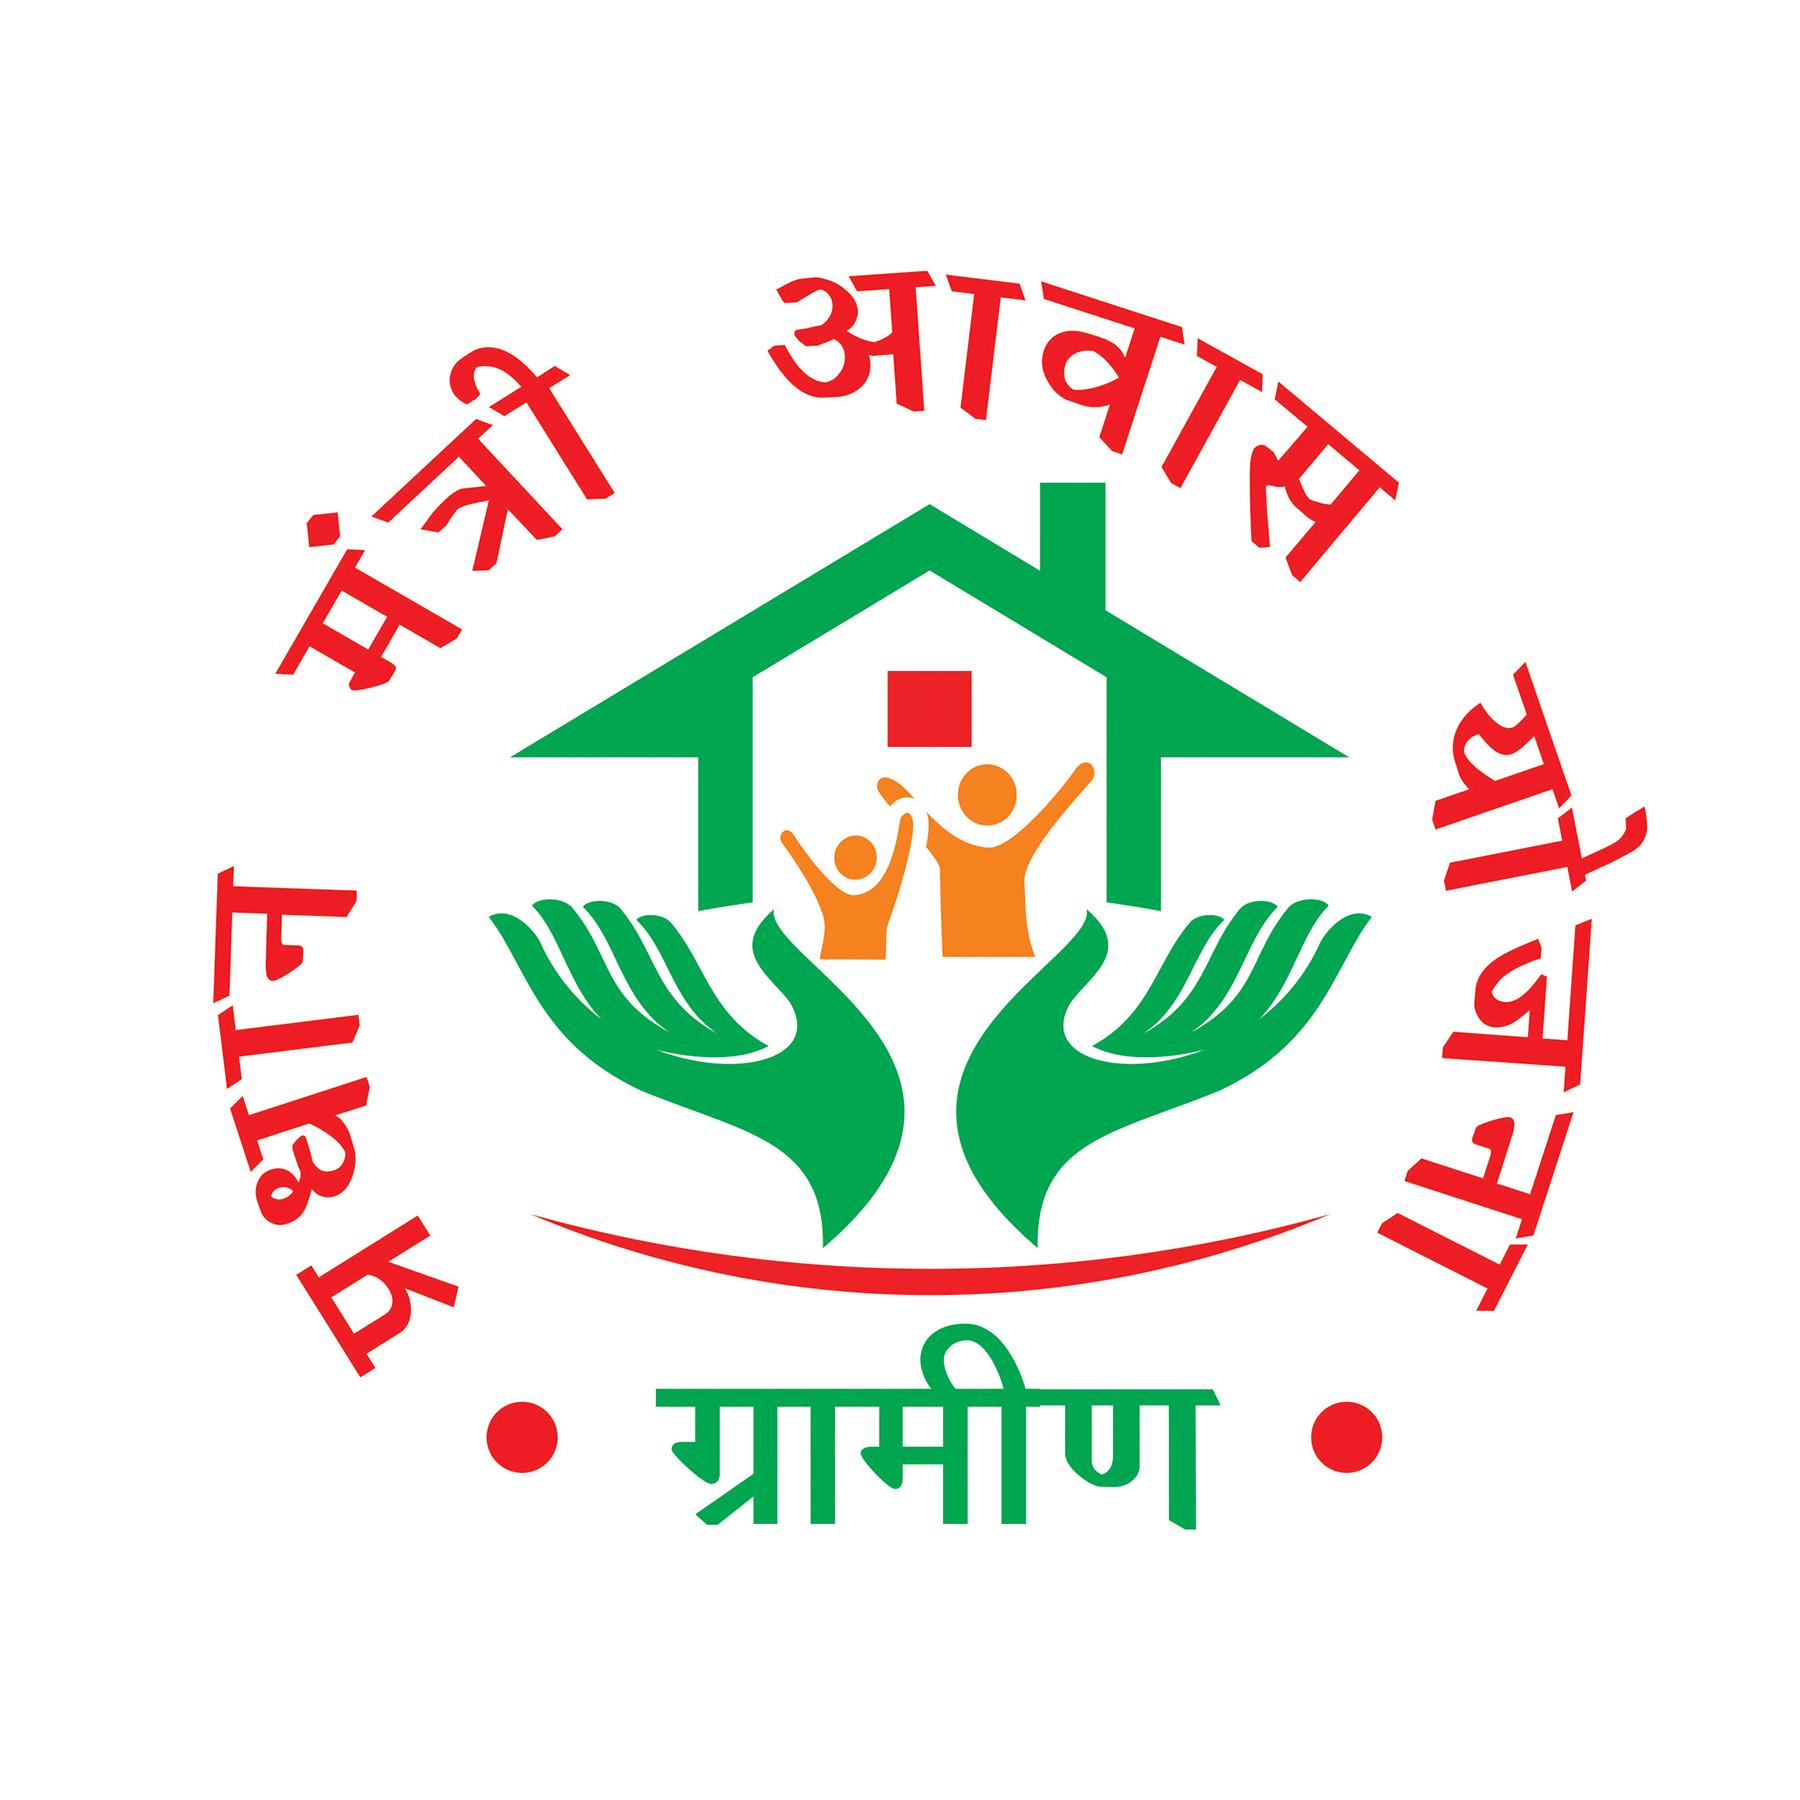 Design a logo for Pradhan Mantri Awaas Yojana.